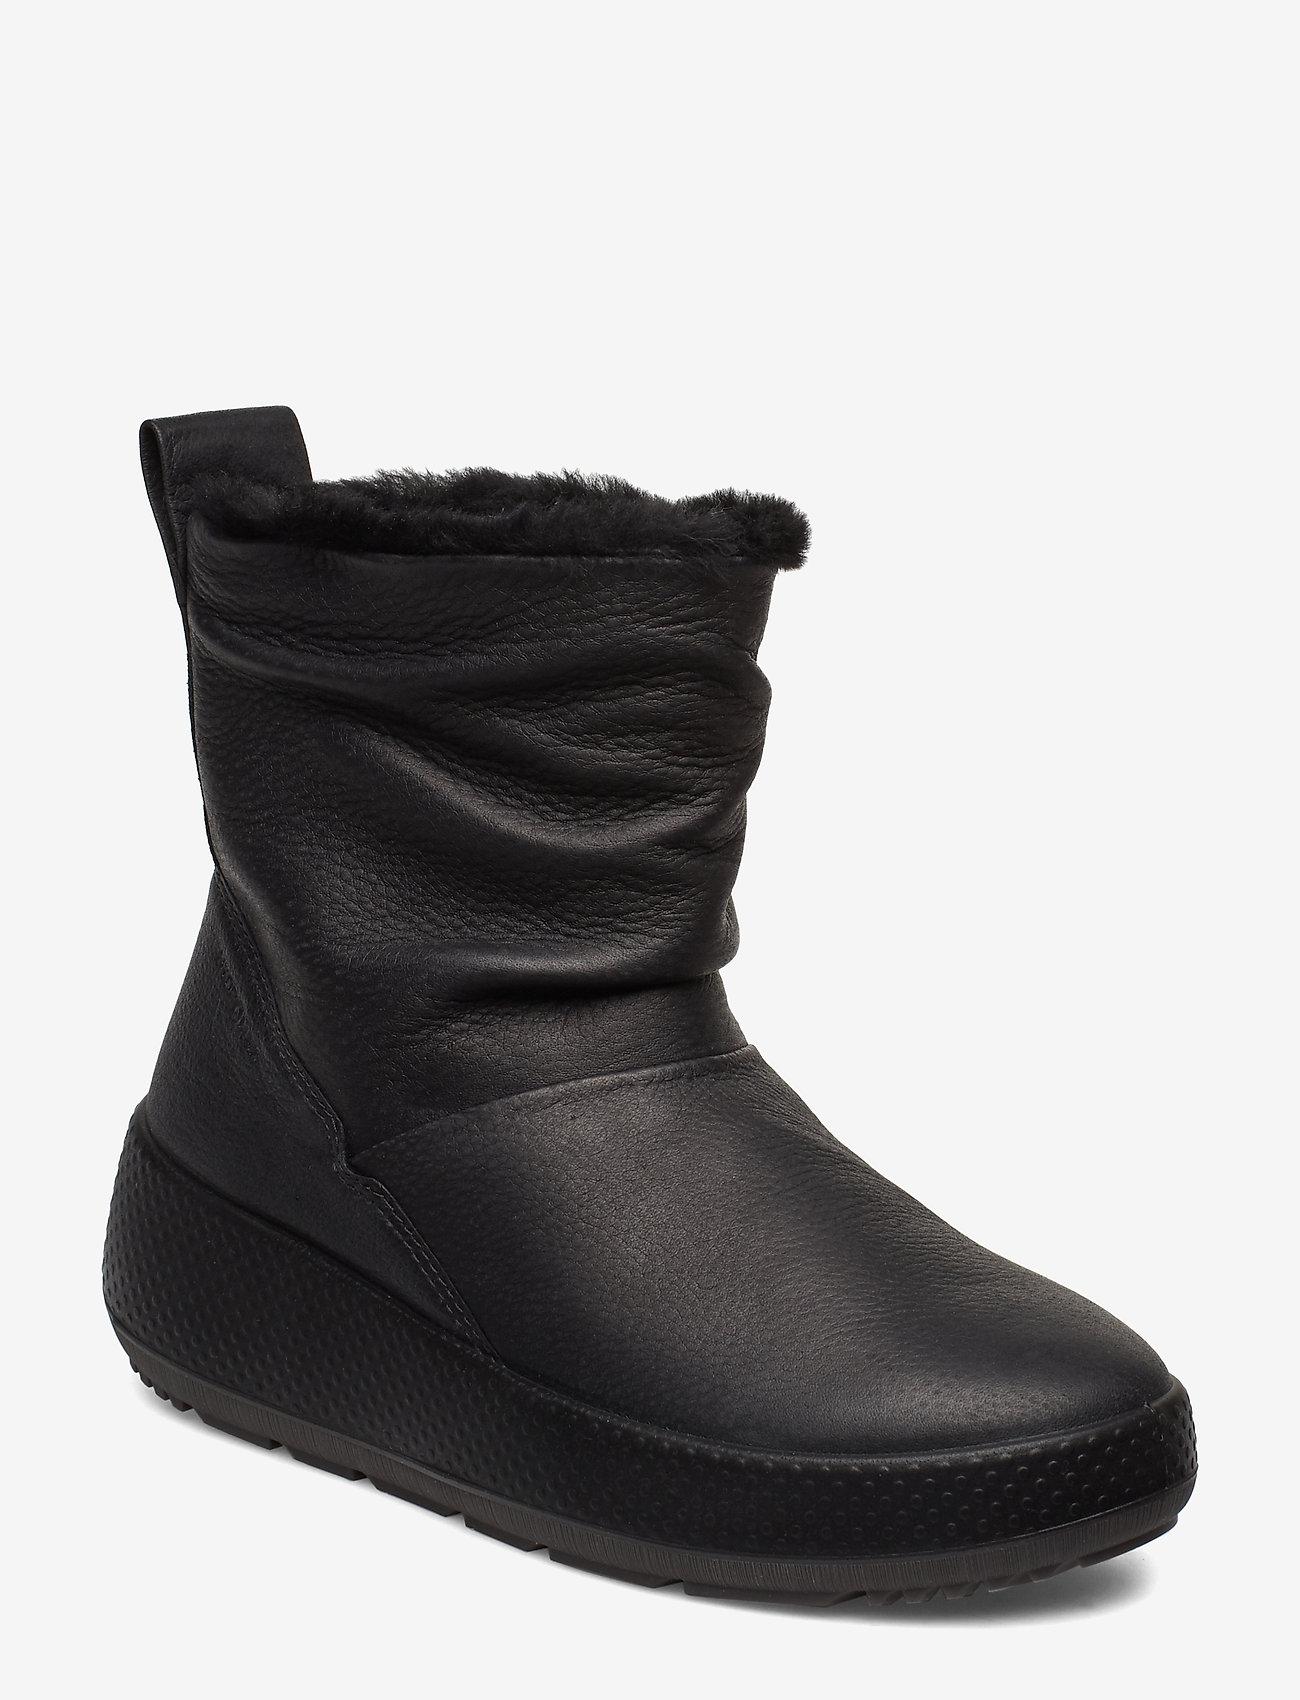 ECCO - UKIUK 2.0 - flat ankle boots - black - 1